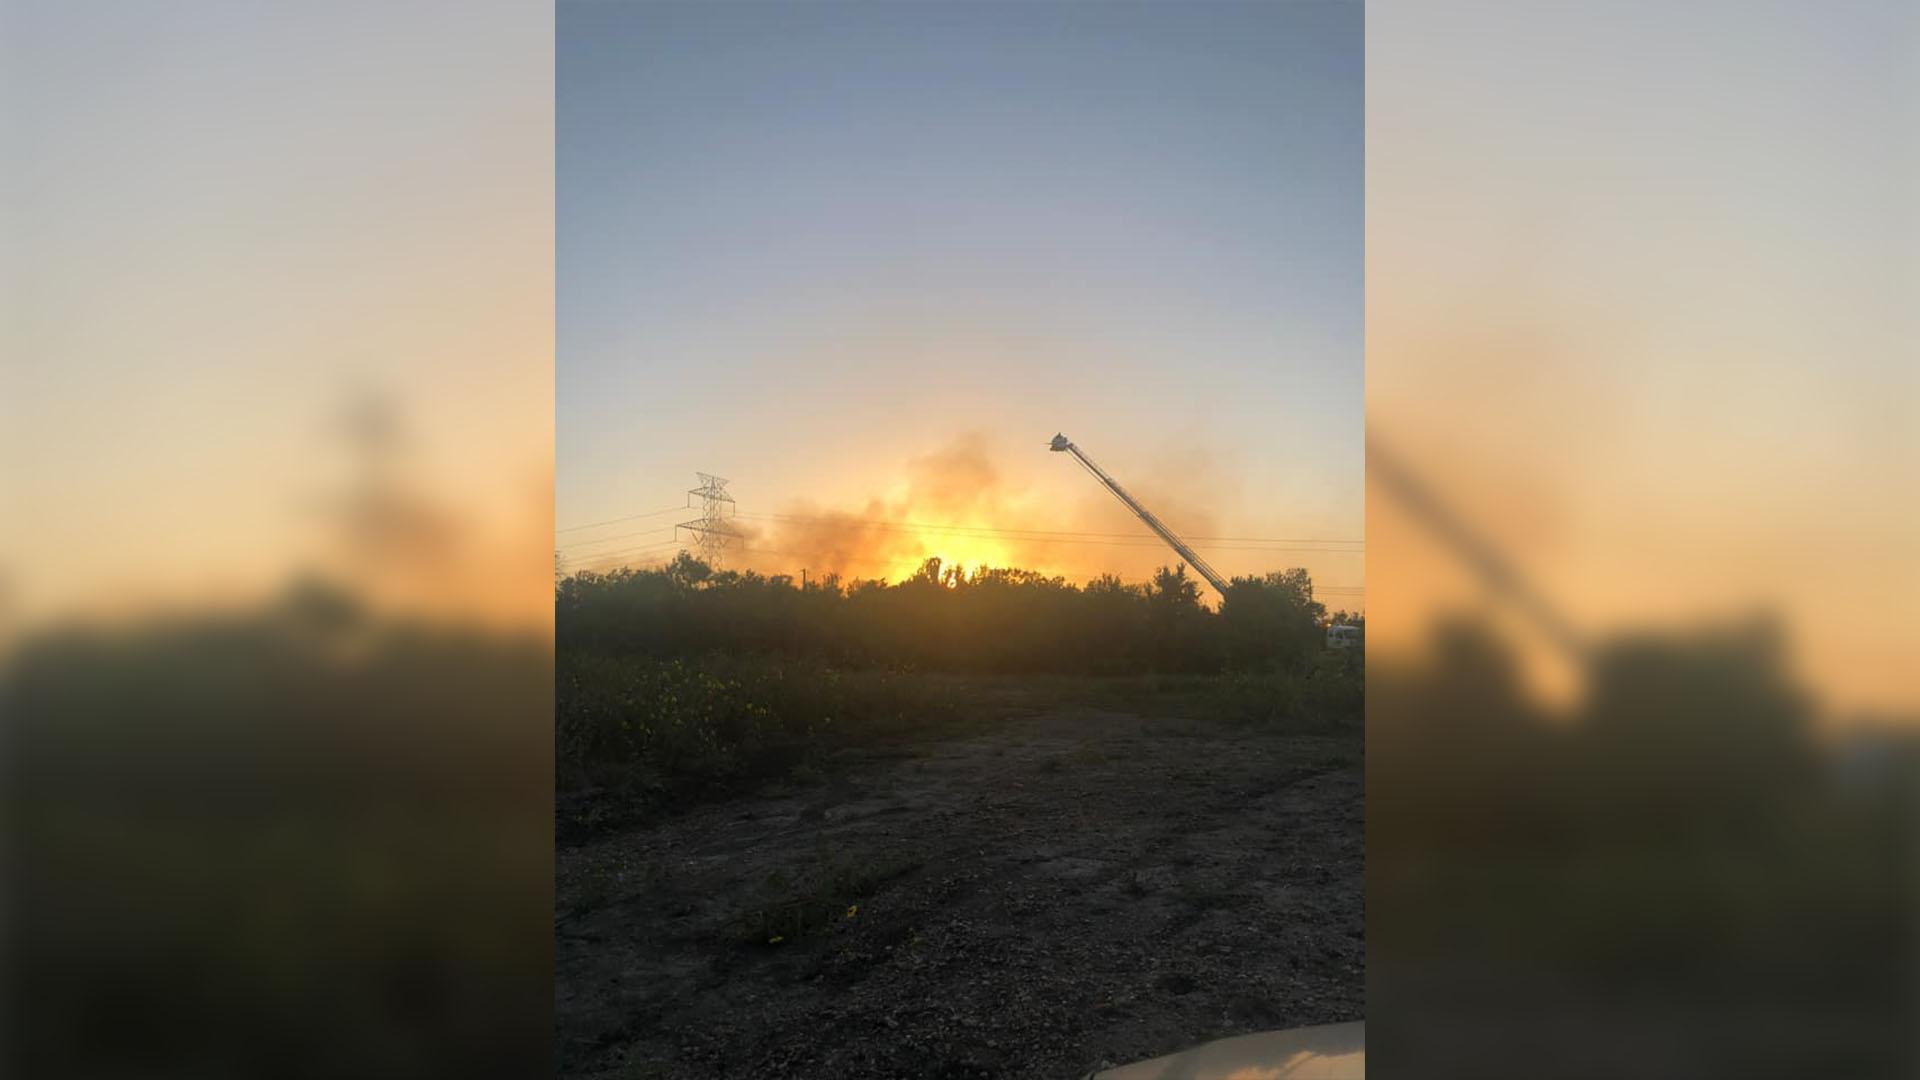 Fire off State Highway 21 in Bastrop County June 26, 2021 (Courtesy: Cyndi Boyd-Hebert)